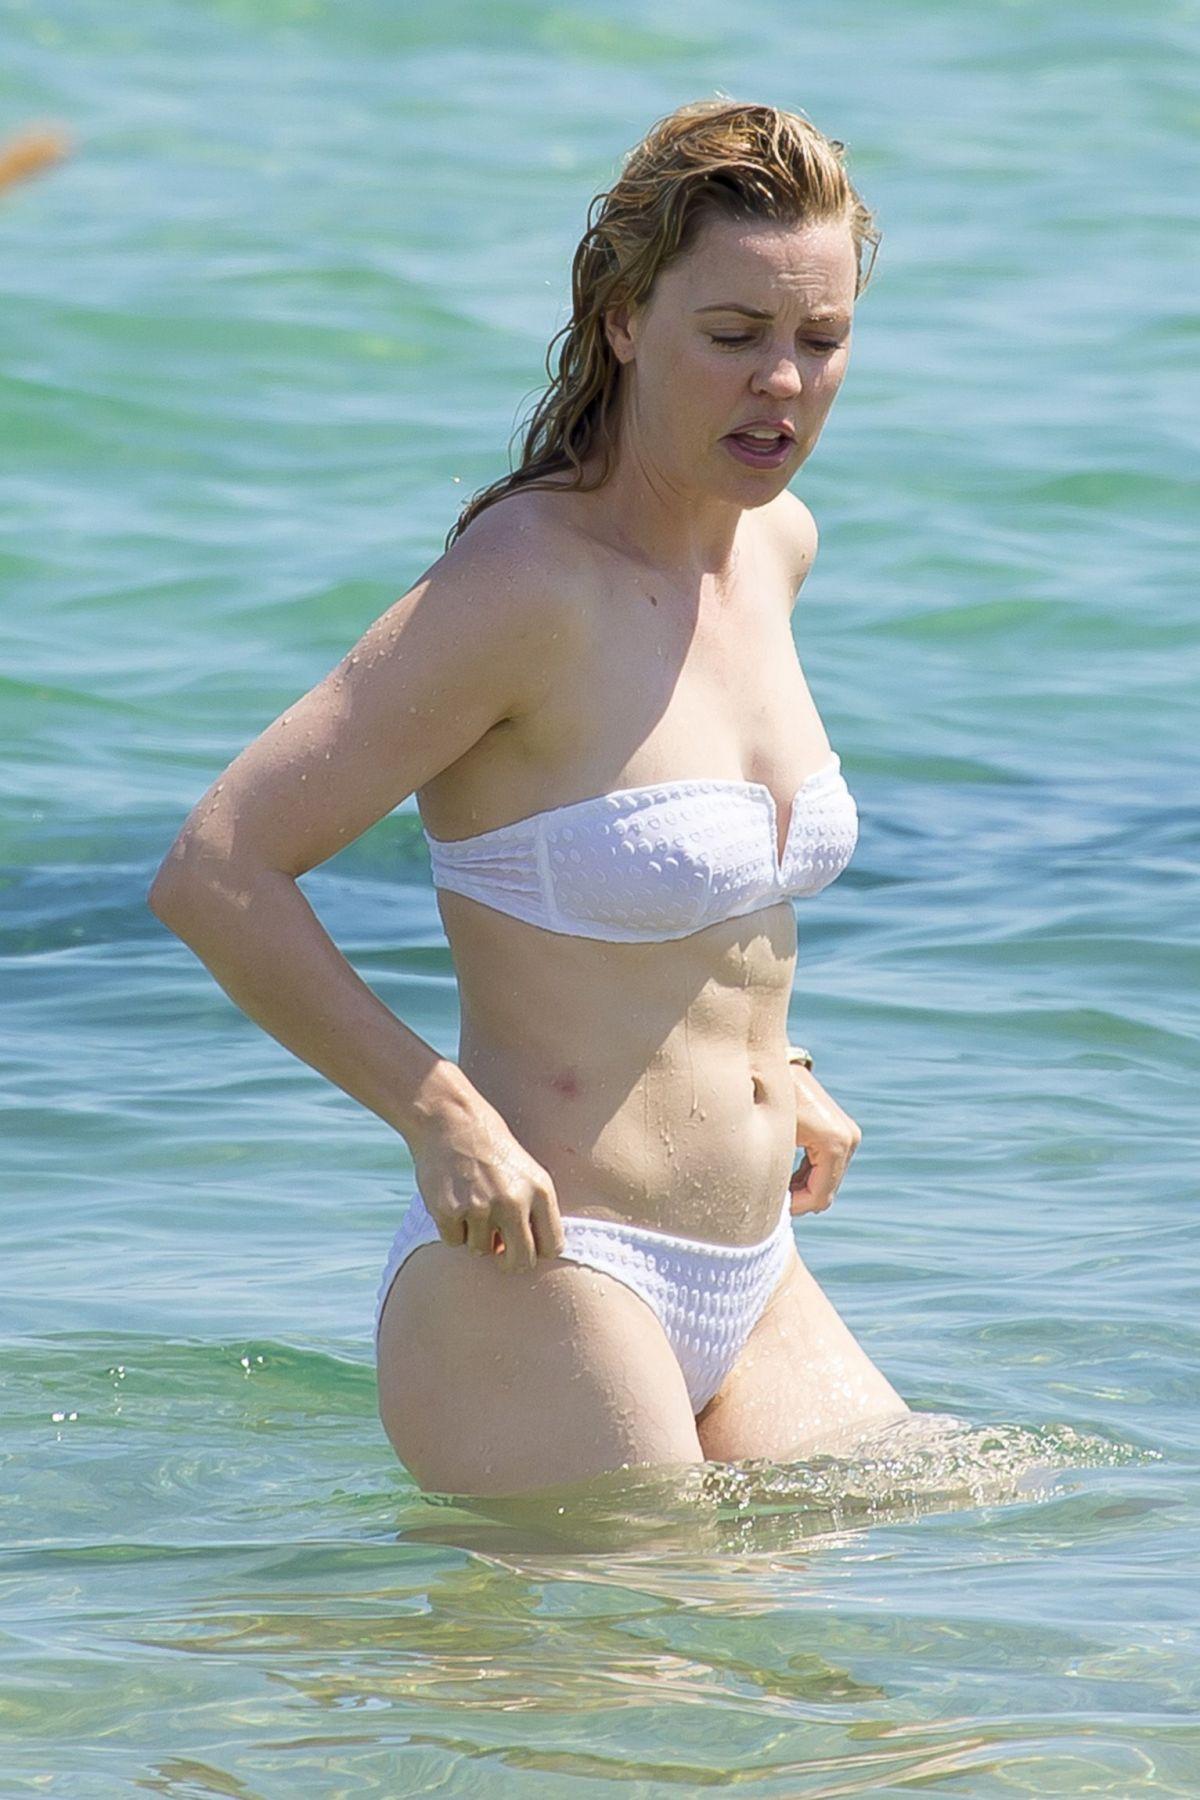 Hot Karolina Wozniak nude photos 2019